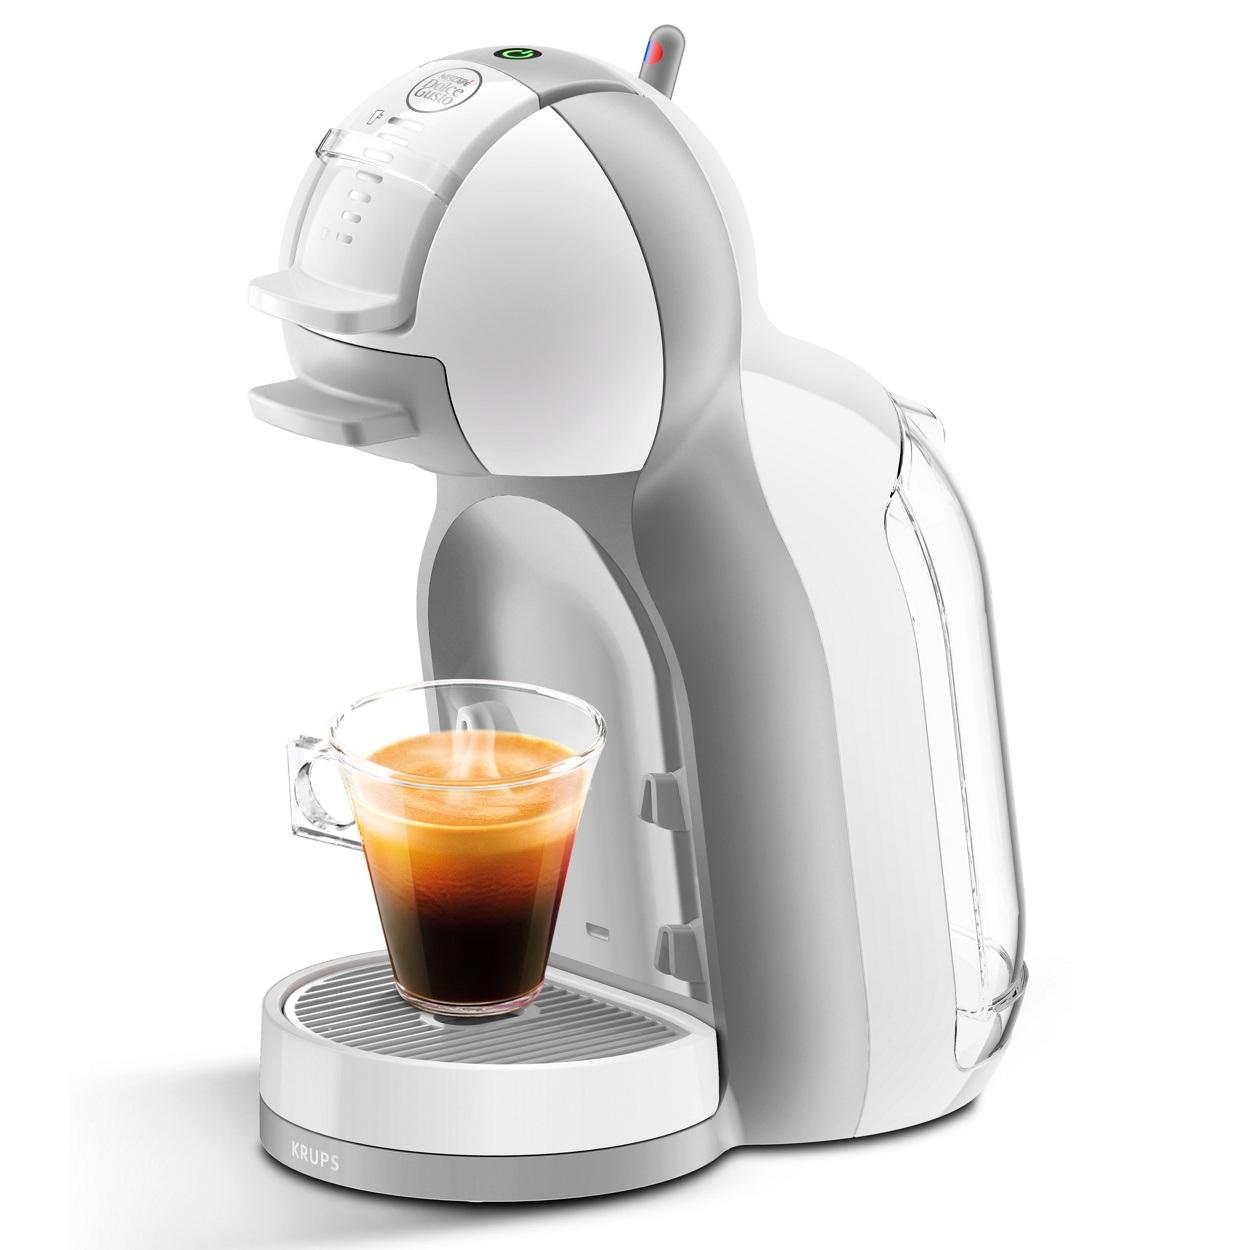 krups kp1201040 nescafe capsule coffee maker machine. Black Bedroom Furniture Sets. Home Design Ideas